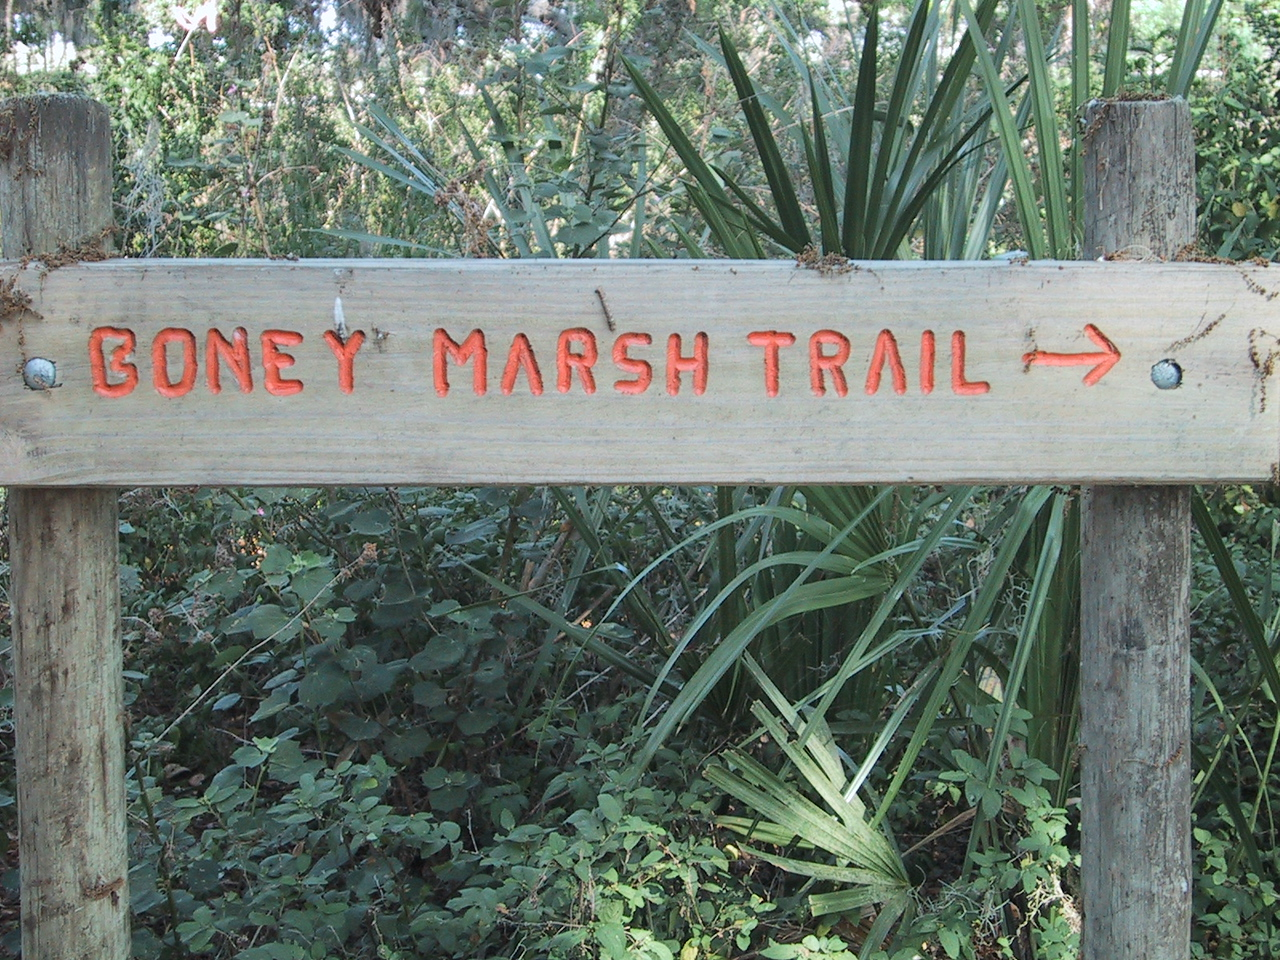 This way to Boney Marsh!<br /> location: Boney Marsh<br /> photo credit: Paul Guyon / Florida Trail Association